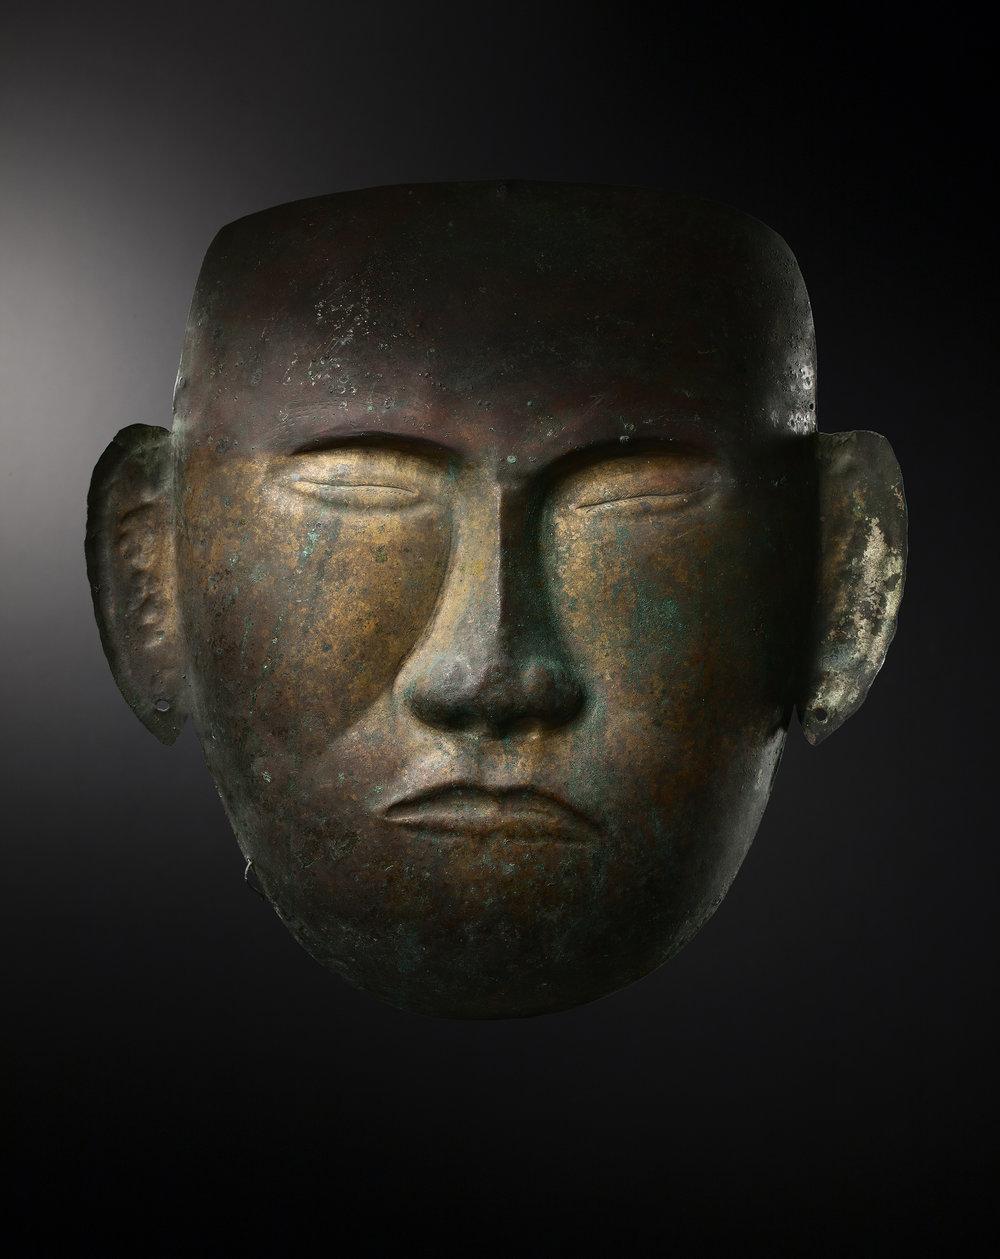 Death Mask - China, Liao Dinasty, 907-1125